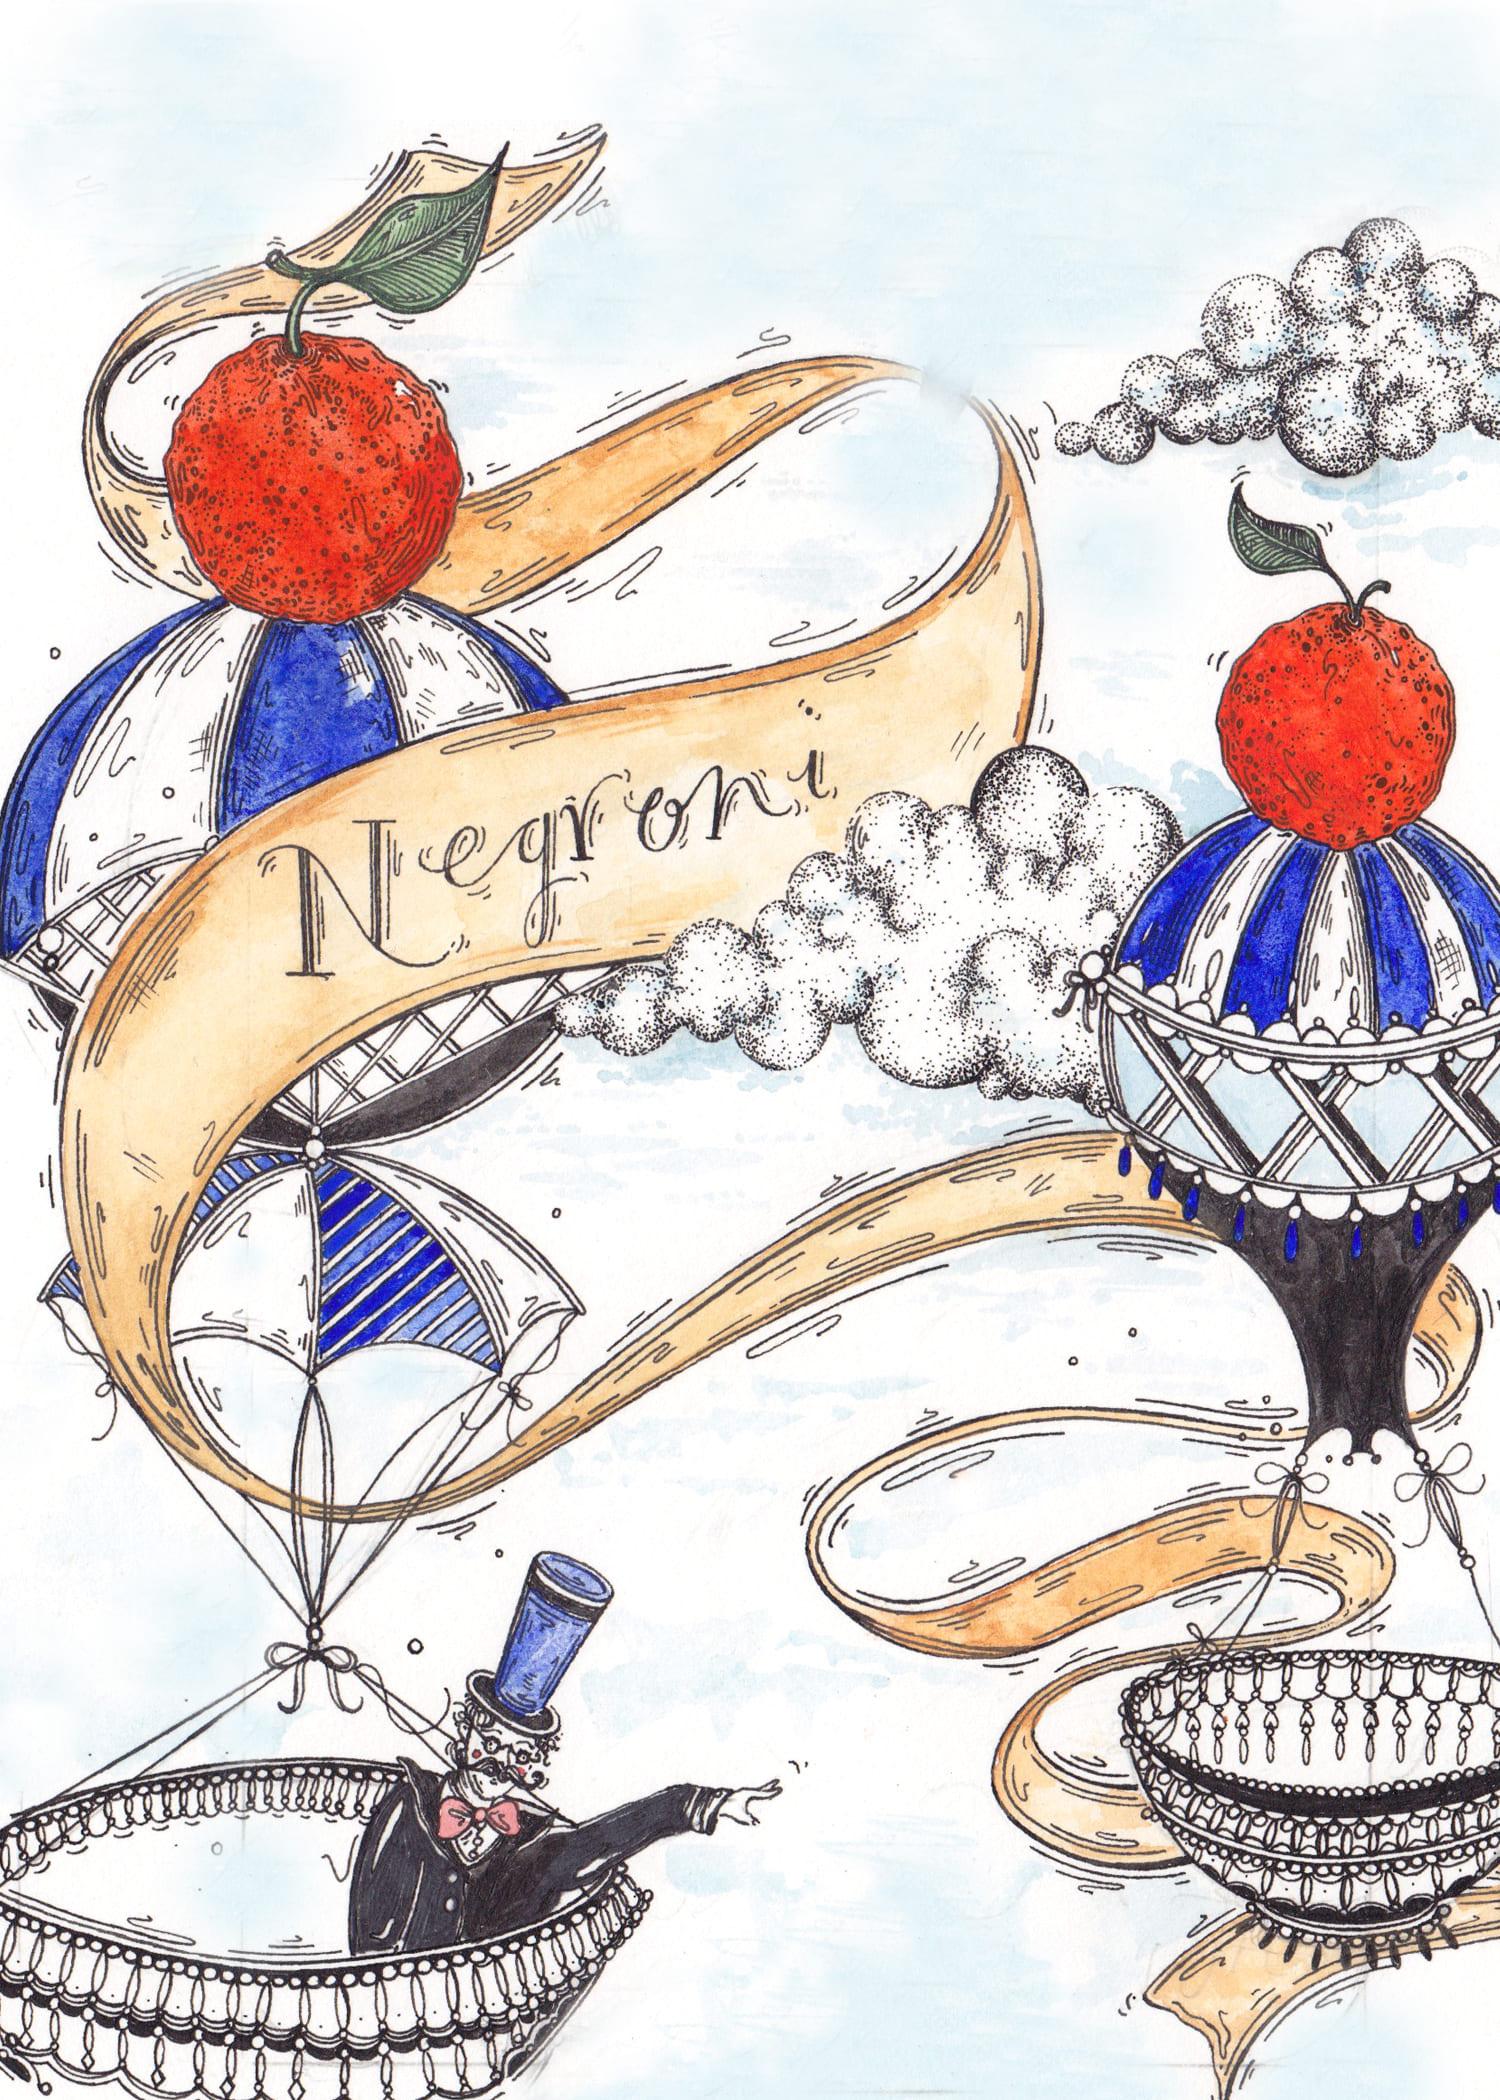 Negroni1.jpg